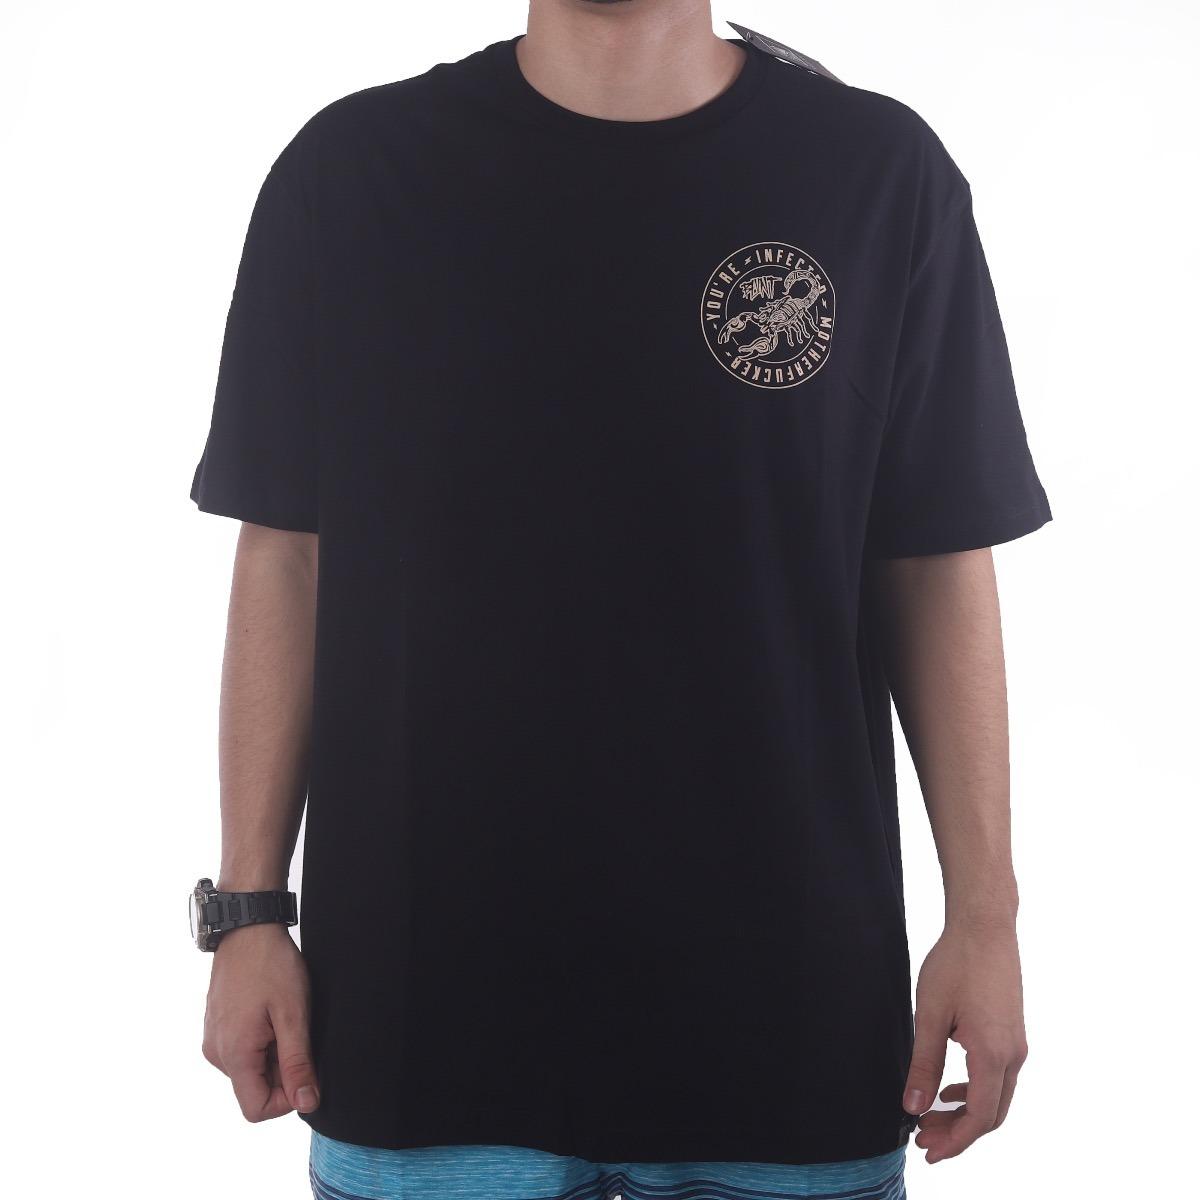 Camiseta Blunt Scorpion (preto) - R  59,90 em Mercado Livre 5b5a0cf6fa